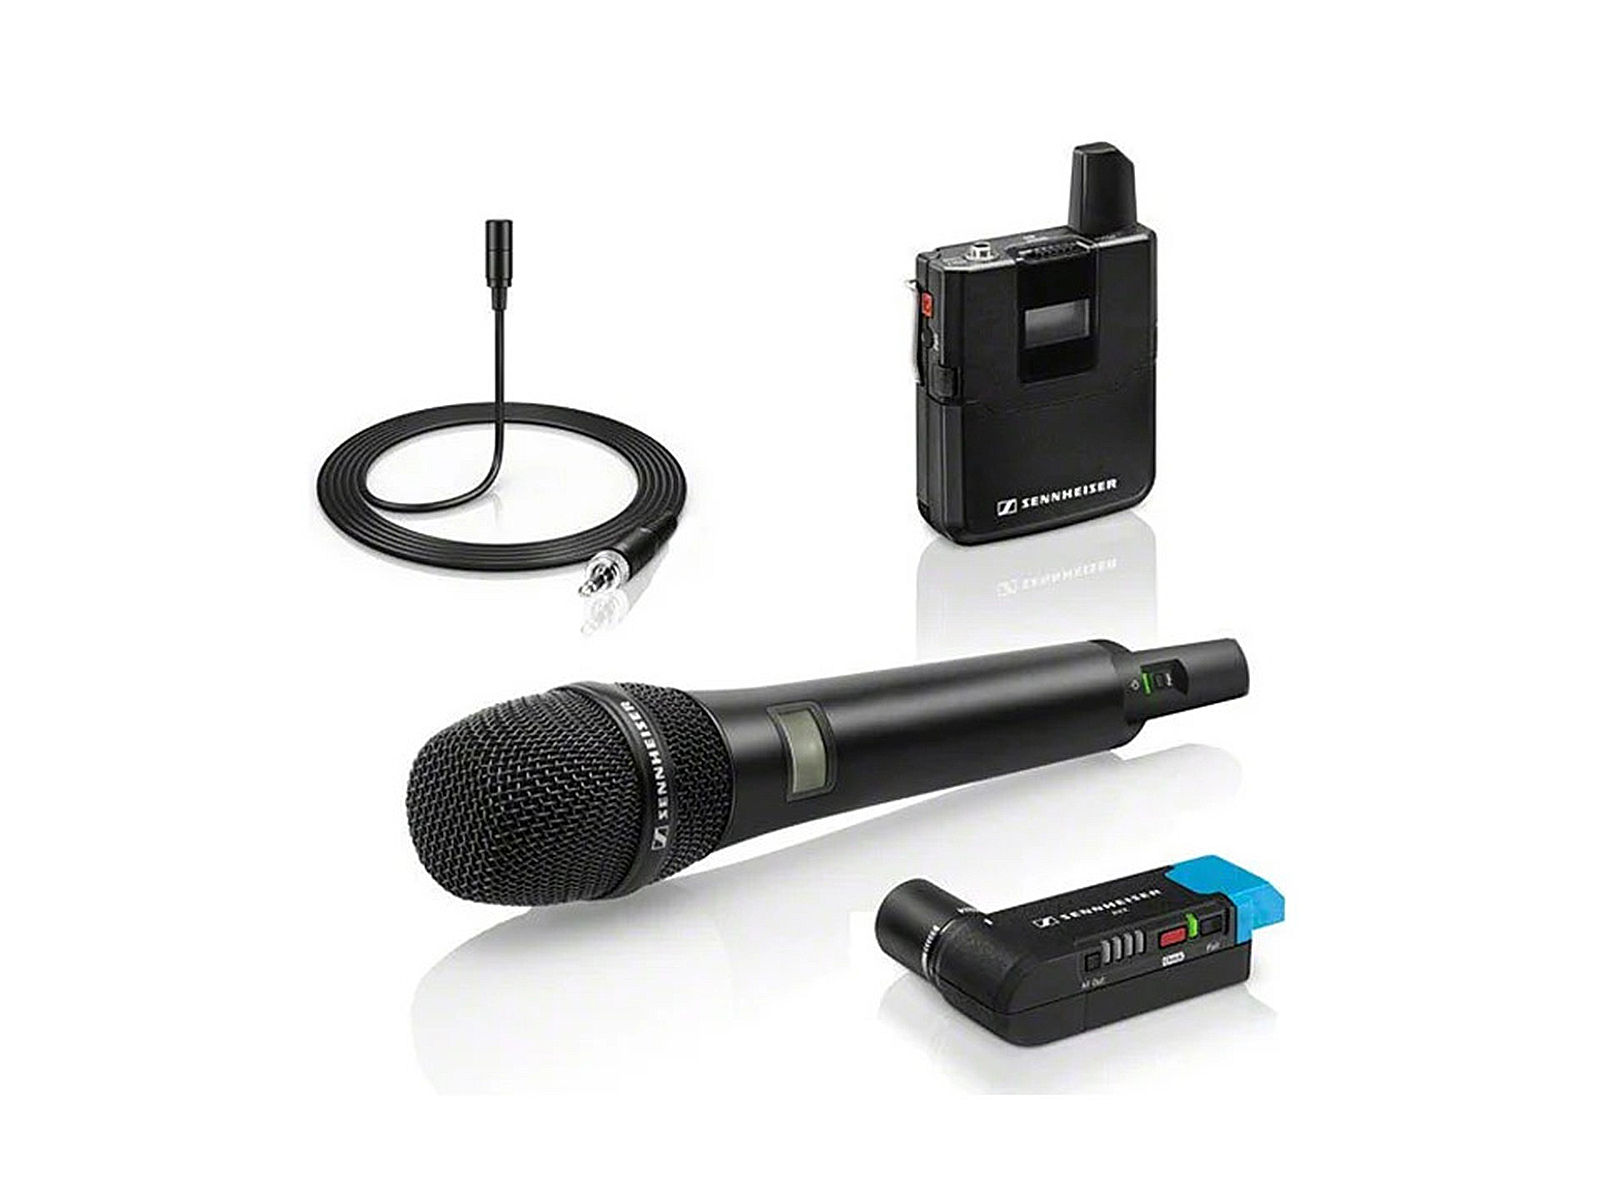 Sennheiser AVX-COMBO SET-3-EU | Drahtloses Mikrofon-System für Film-Ton,